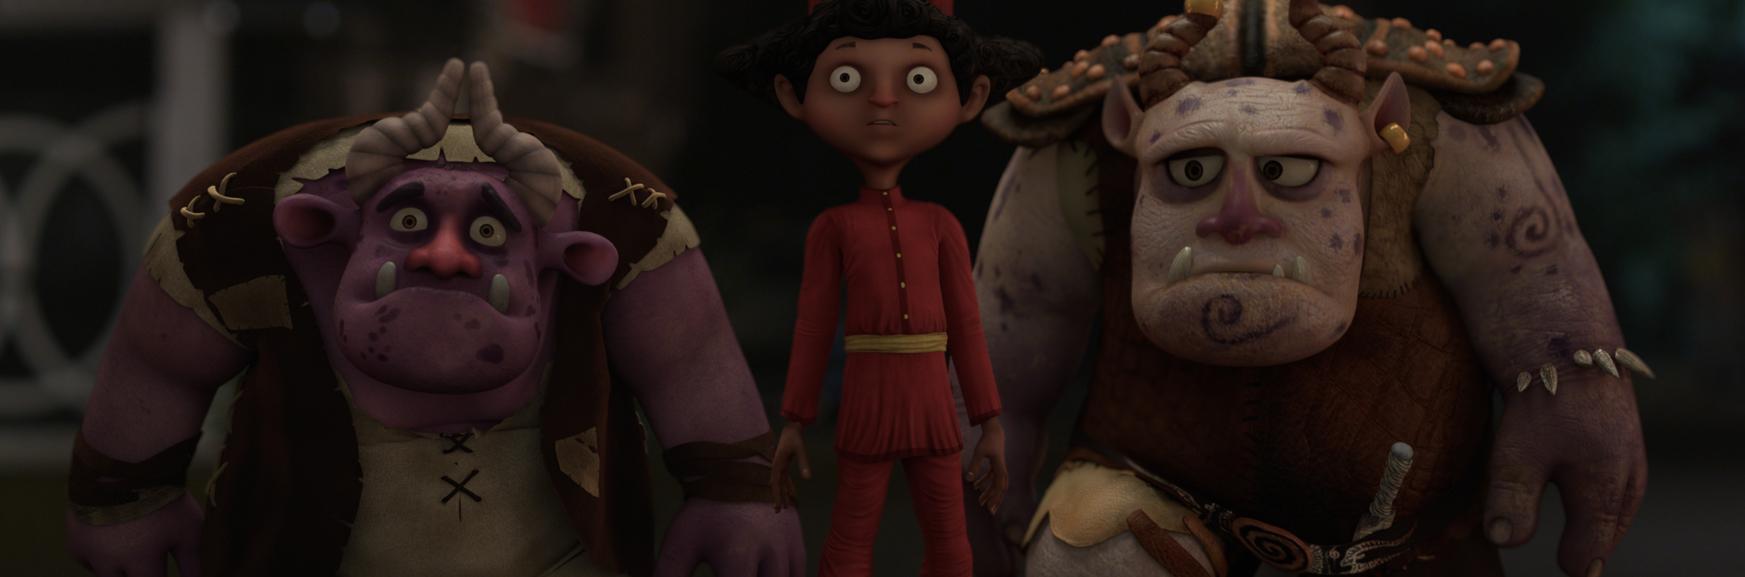 رئال انیمیشن مبارک